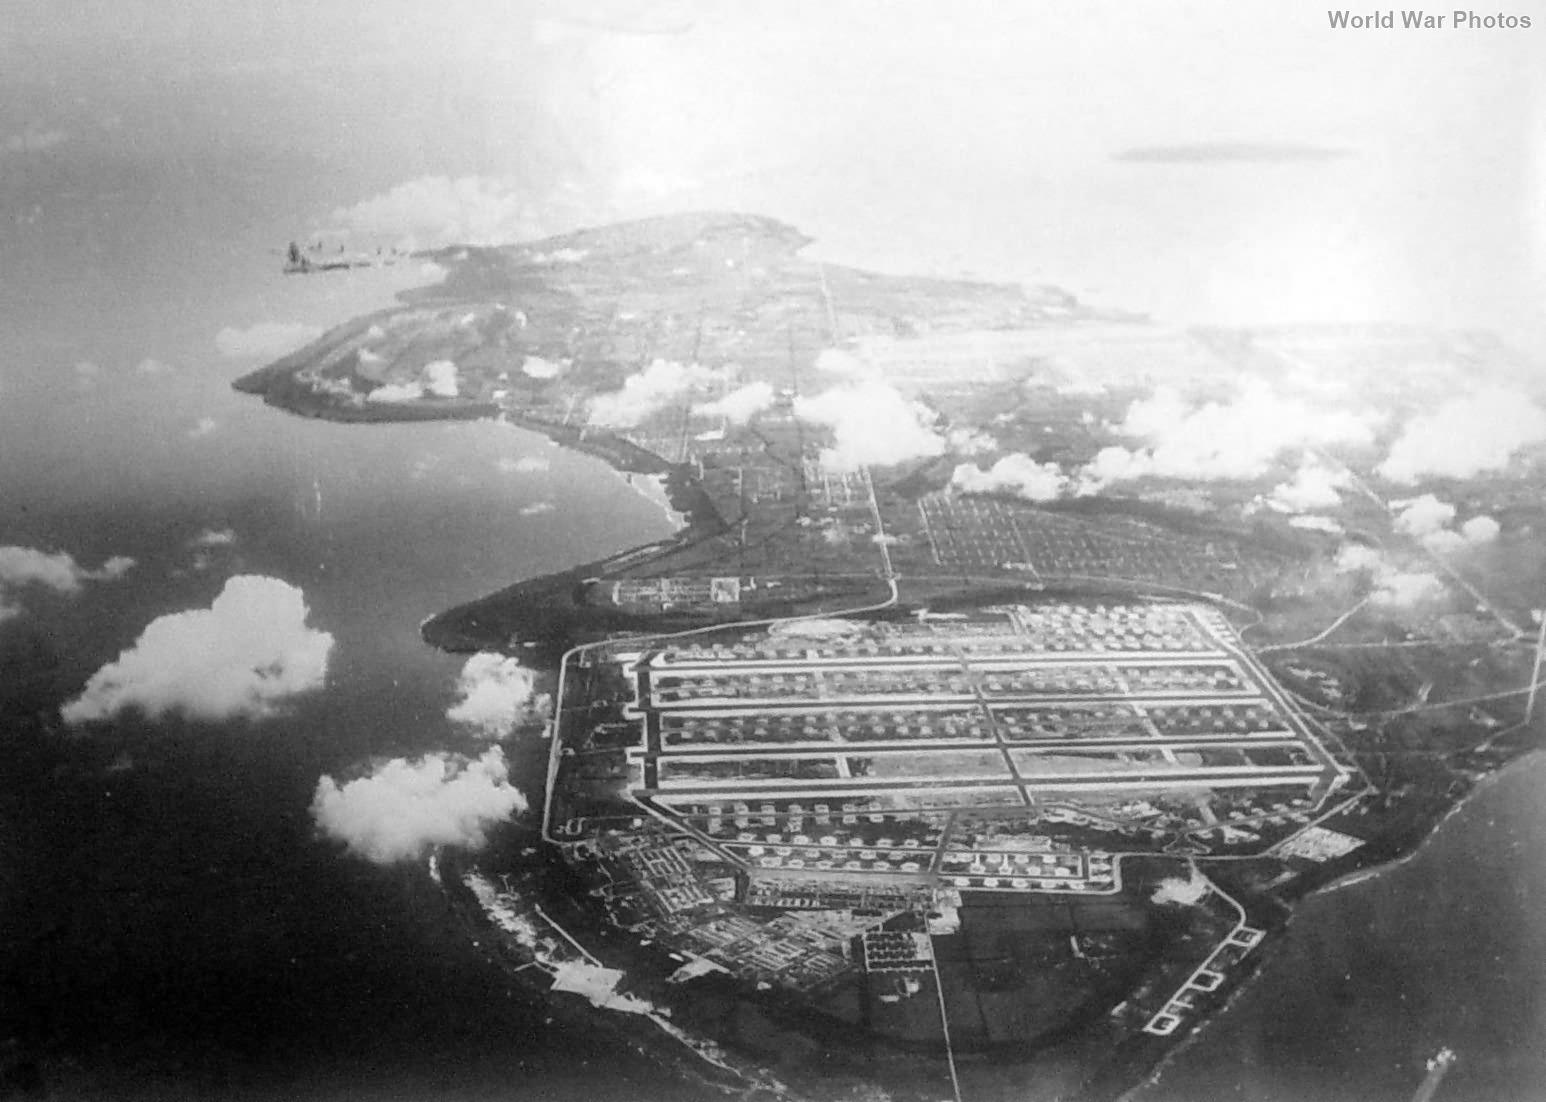 Lone B-29 over base at Tinian Island